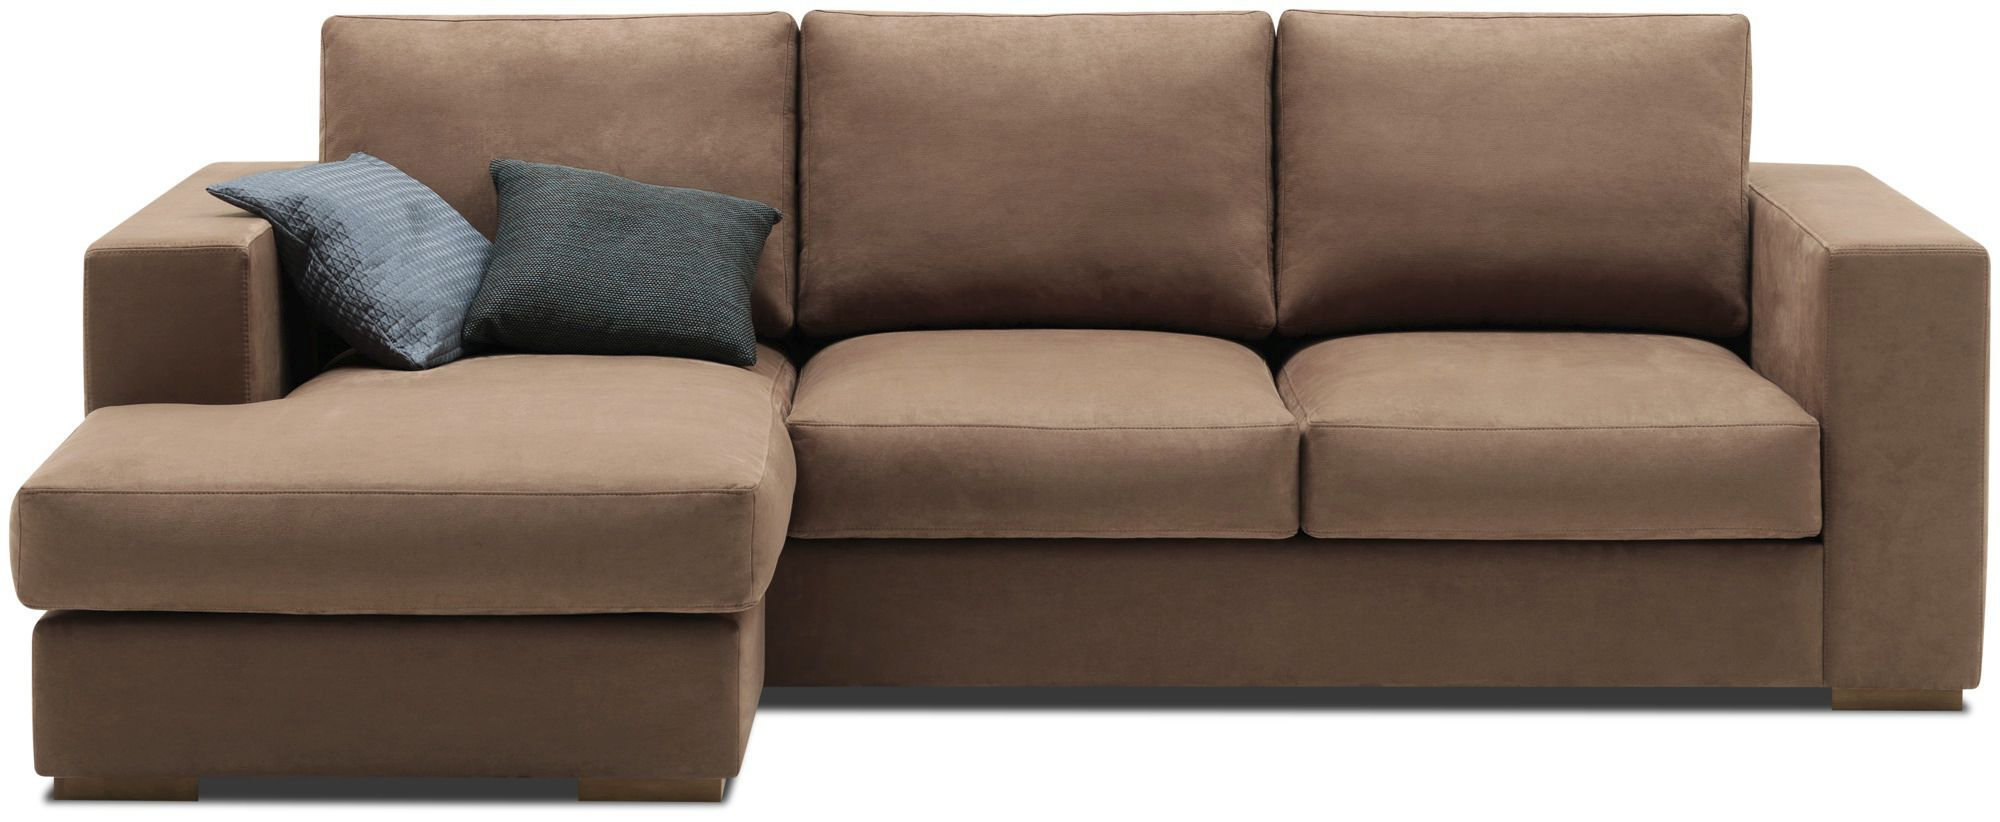 CENOVA - Corner sofa / modular / contemporary / leather by BoConcept |  ArchiExpo